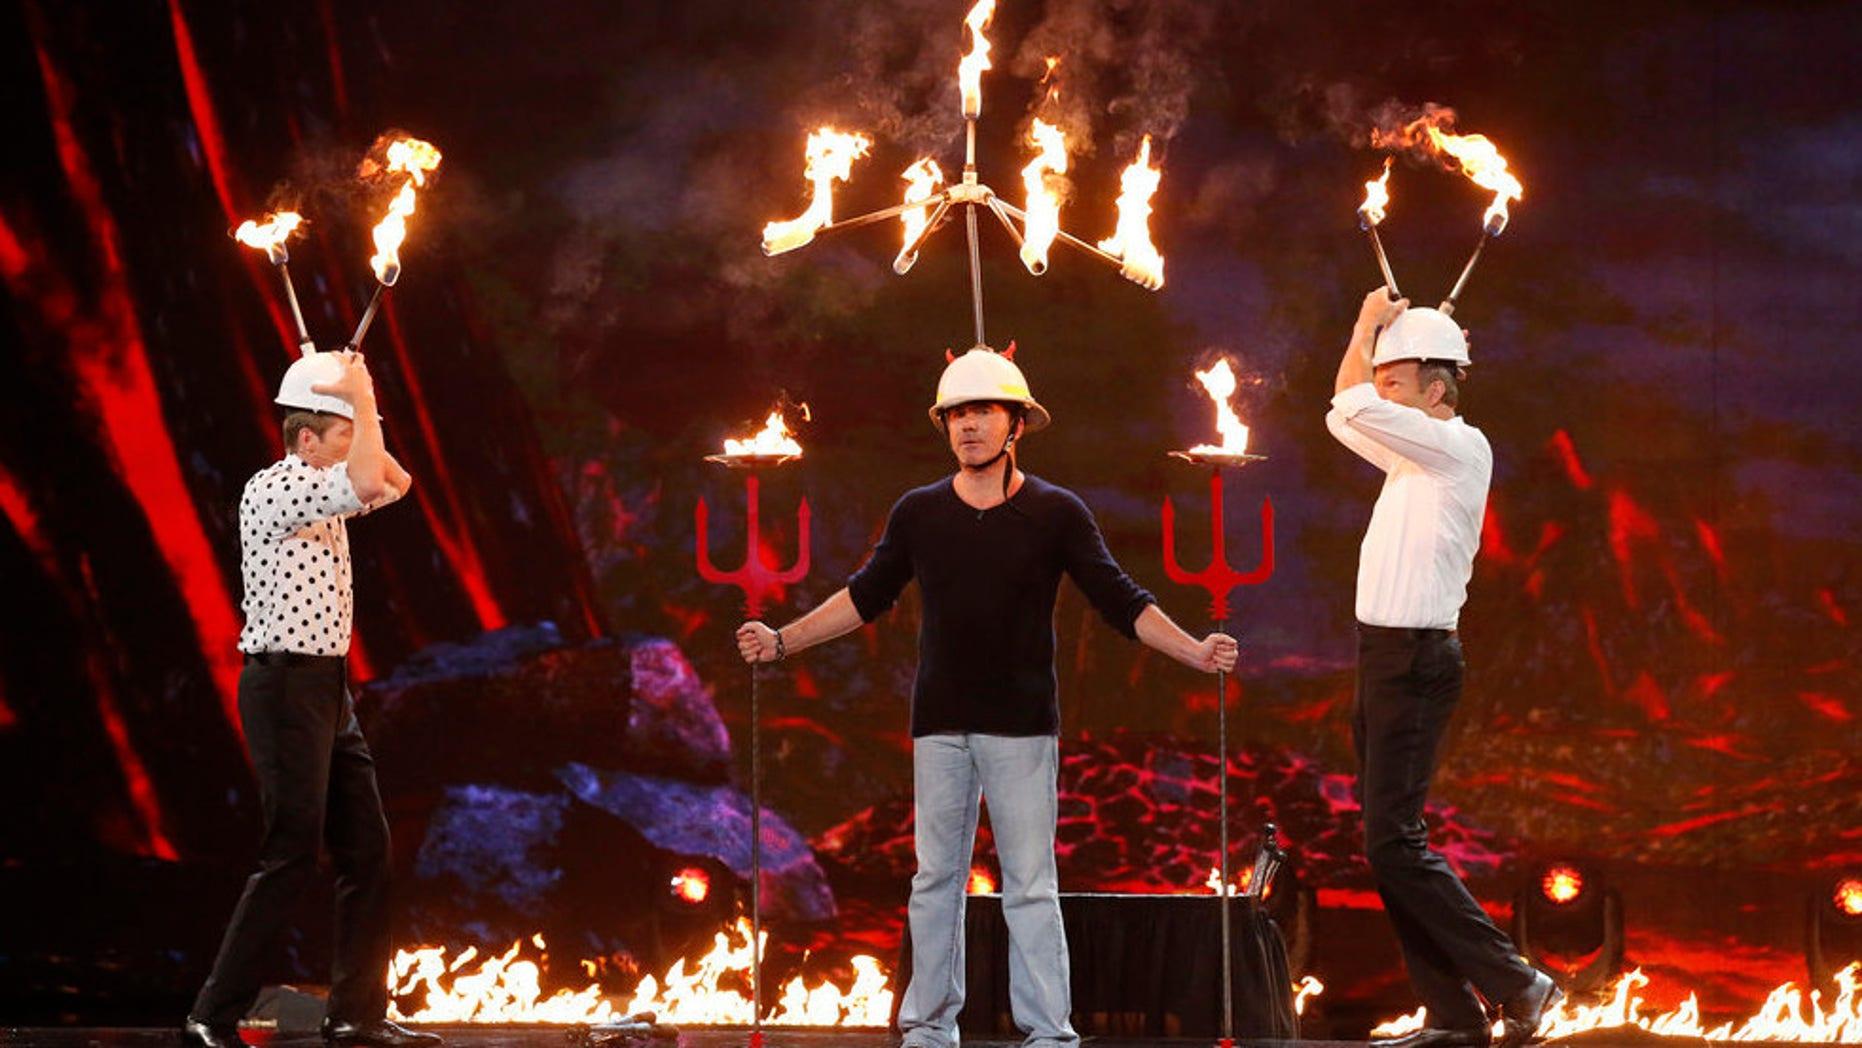 Simon Cowell risks it all on 'America's Got Talent.'